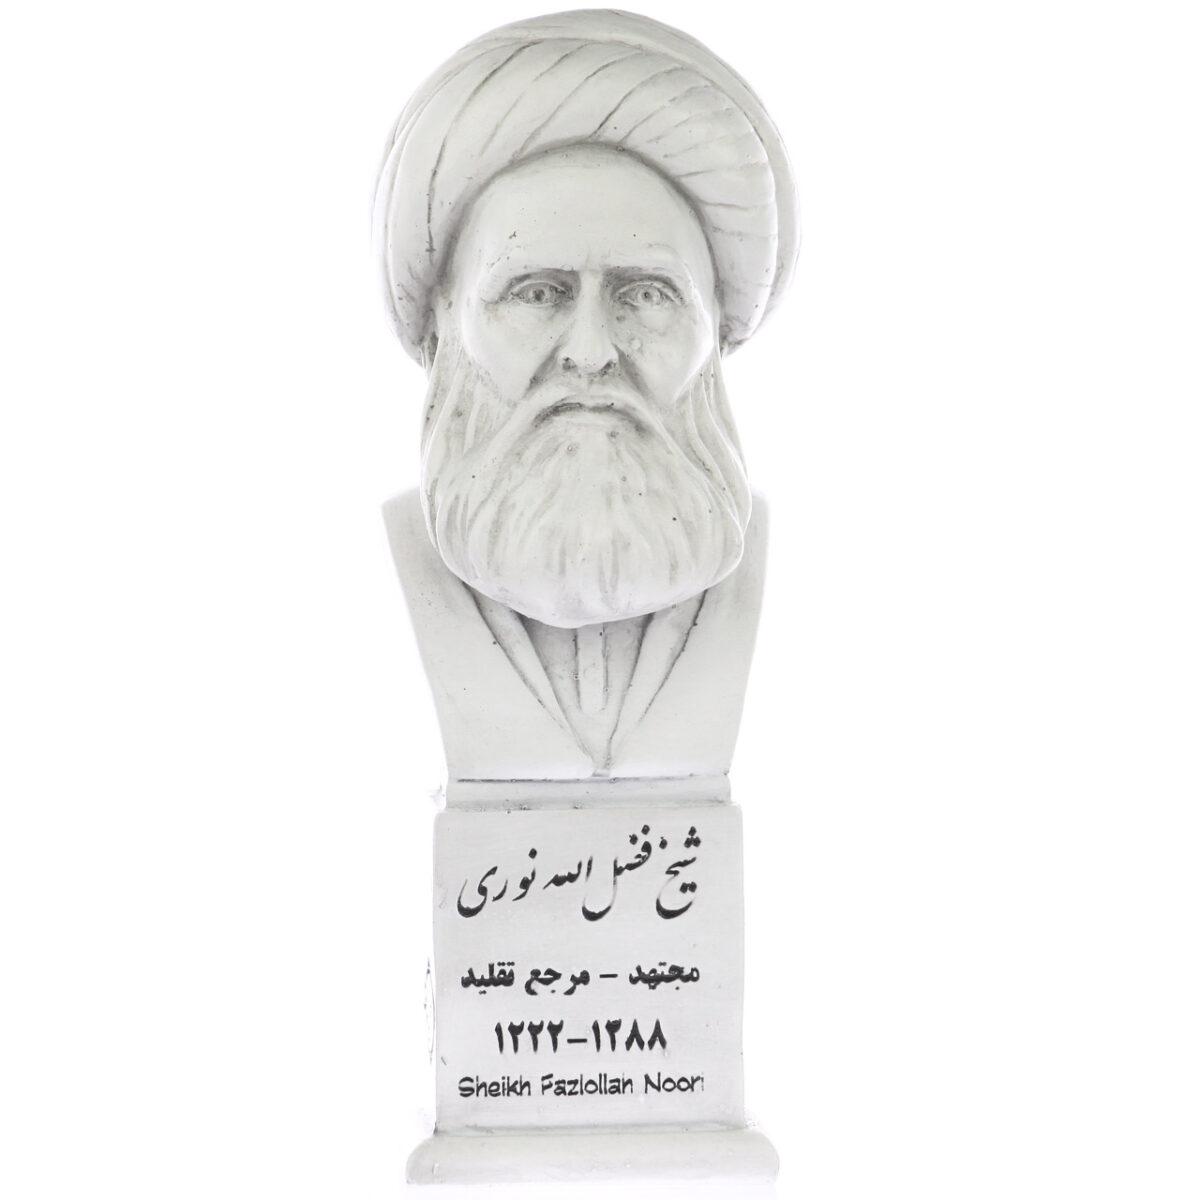 sheikh nouri s 1200x1200 - سردیس شیخ فضل الله نوری